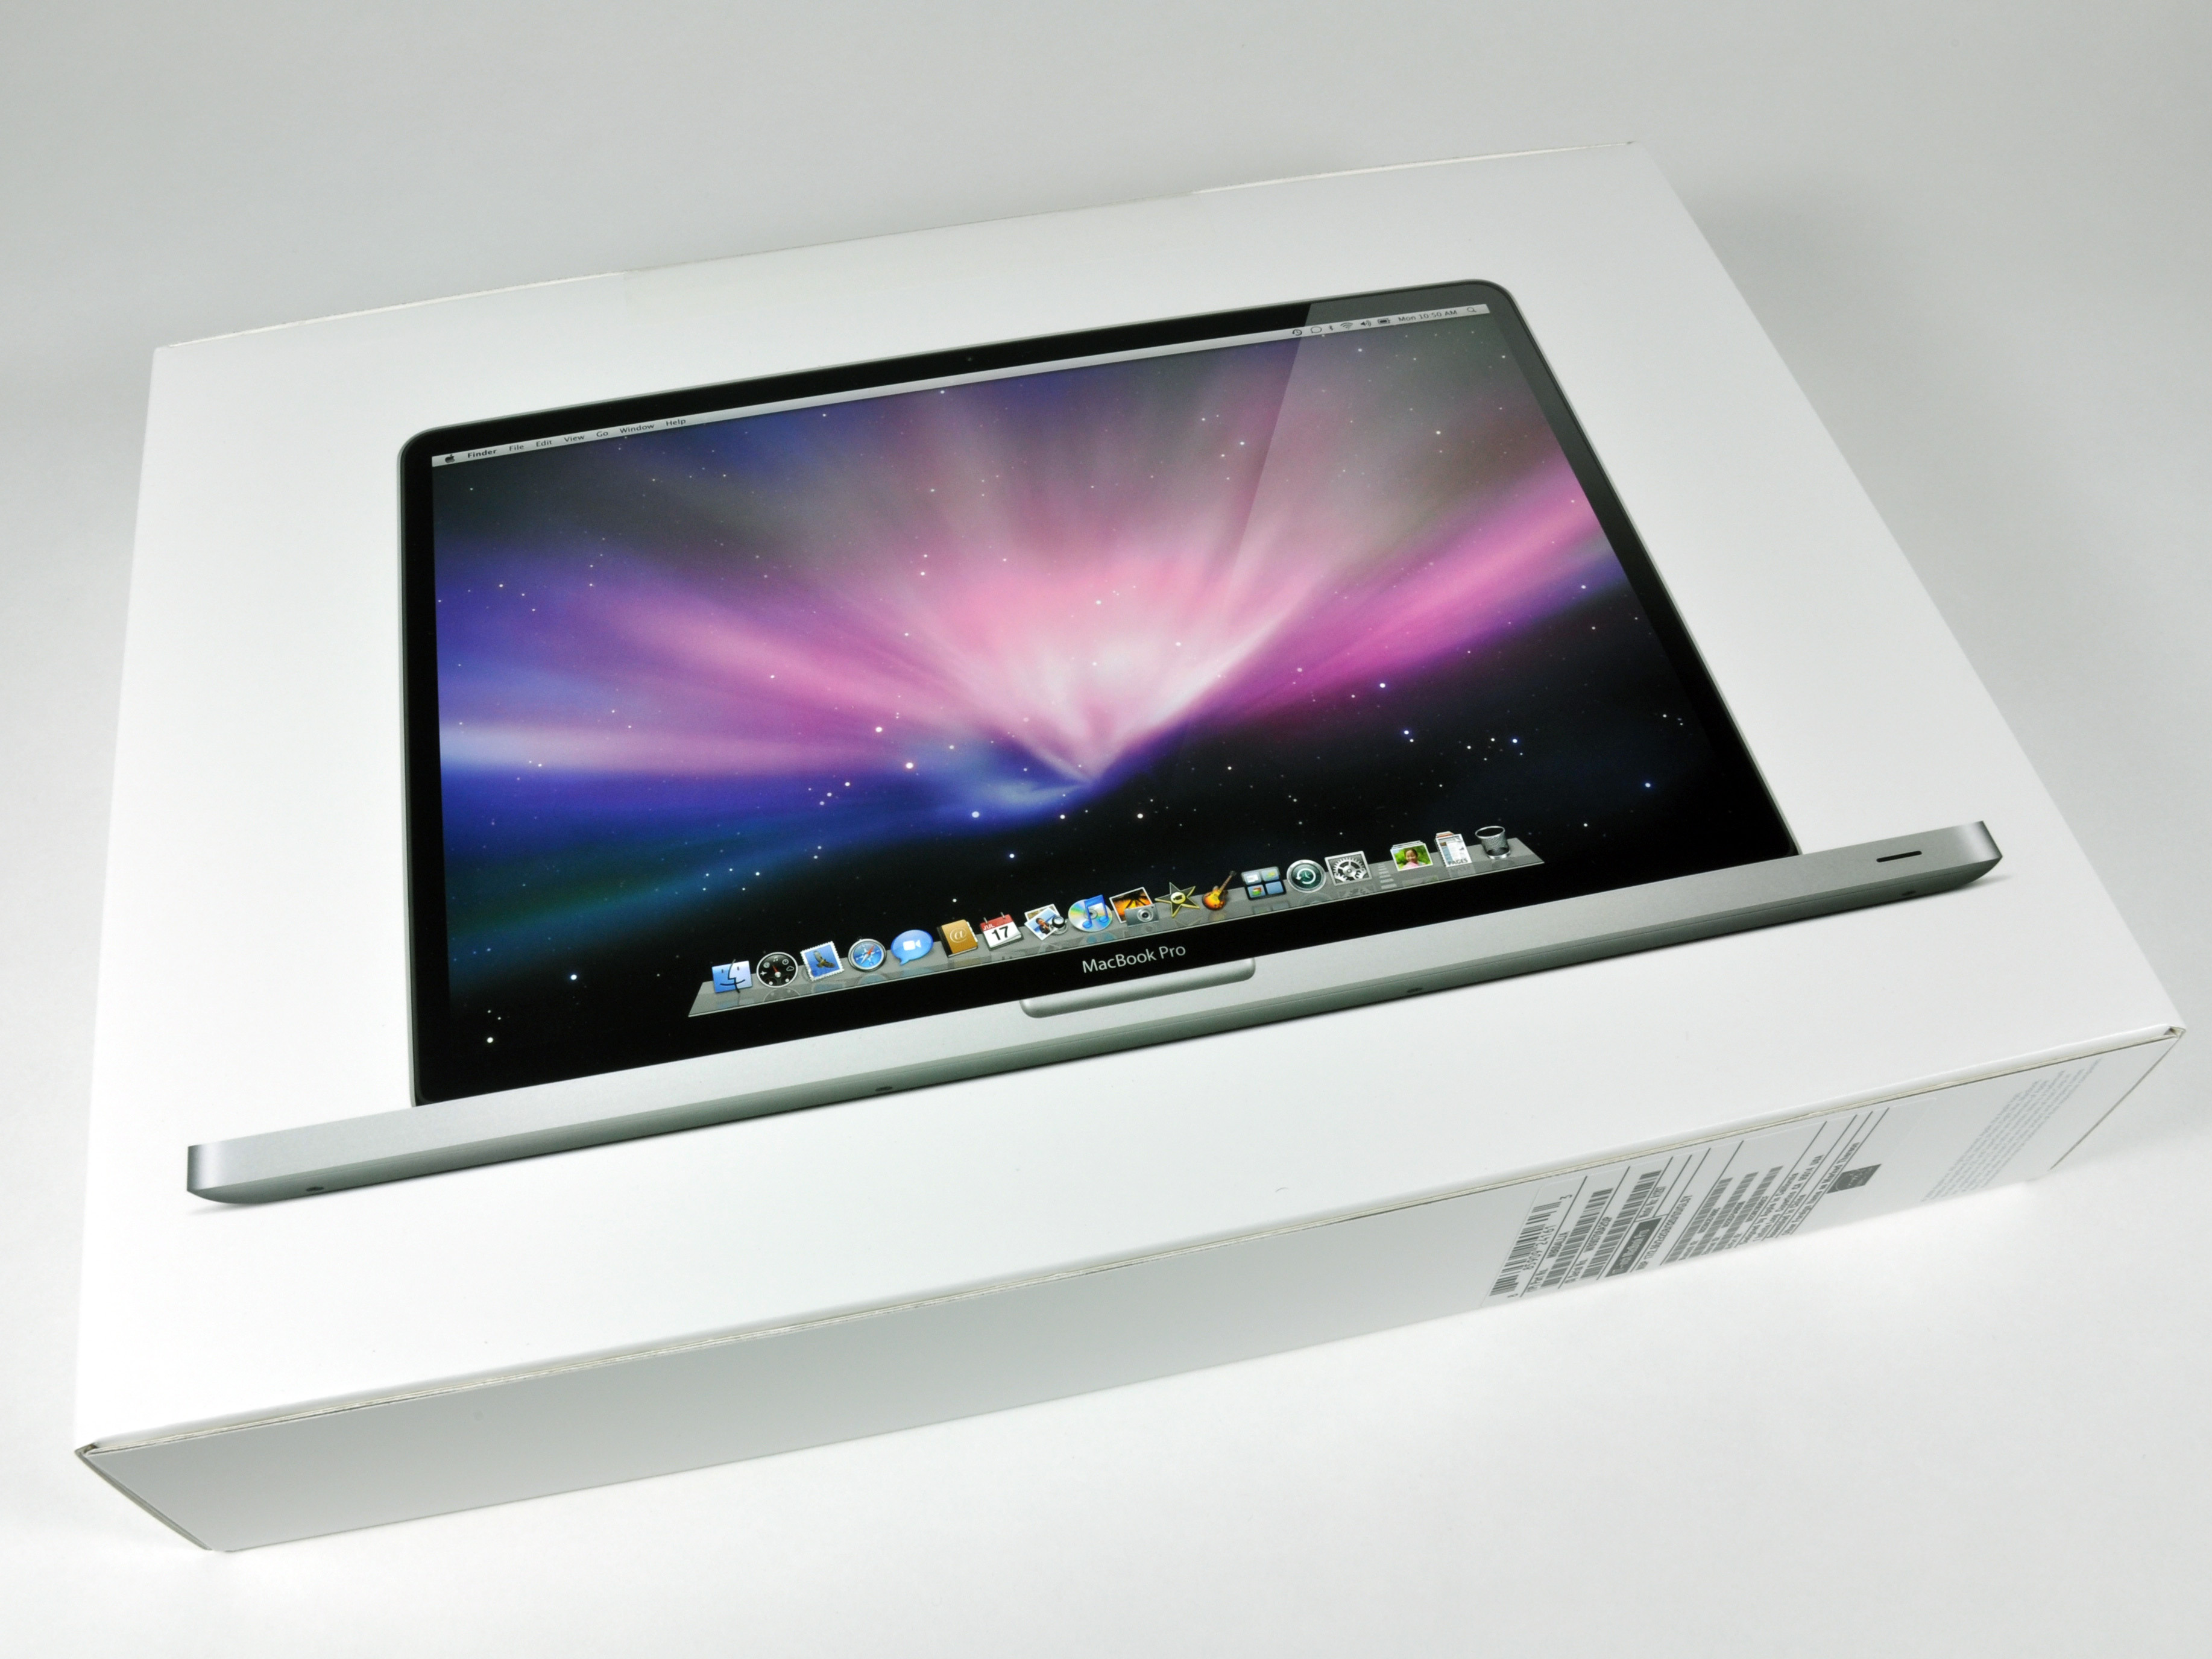 macbook pro 17 unibody teardown ifixit rh ifixit com 2012 13 Unibody MacBook Pro MacBook Pro Size